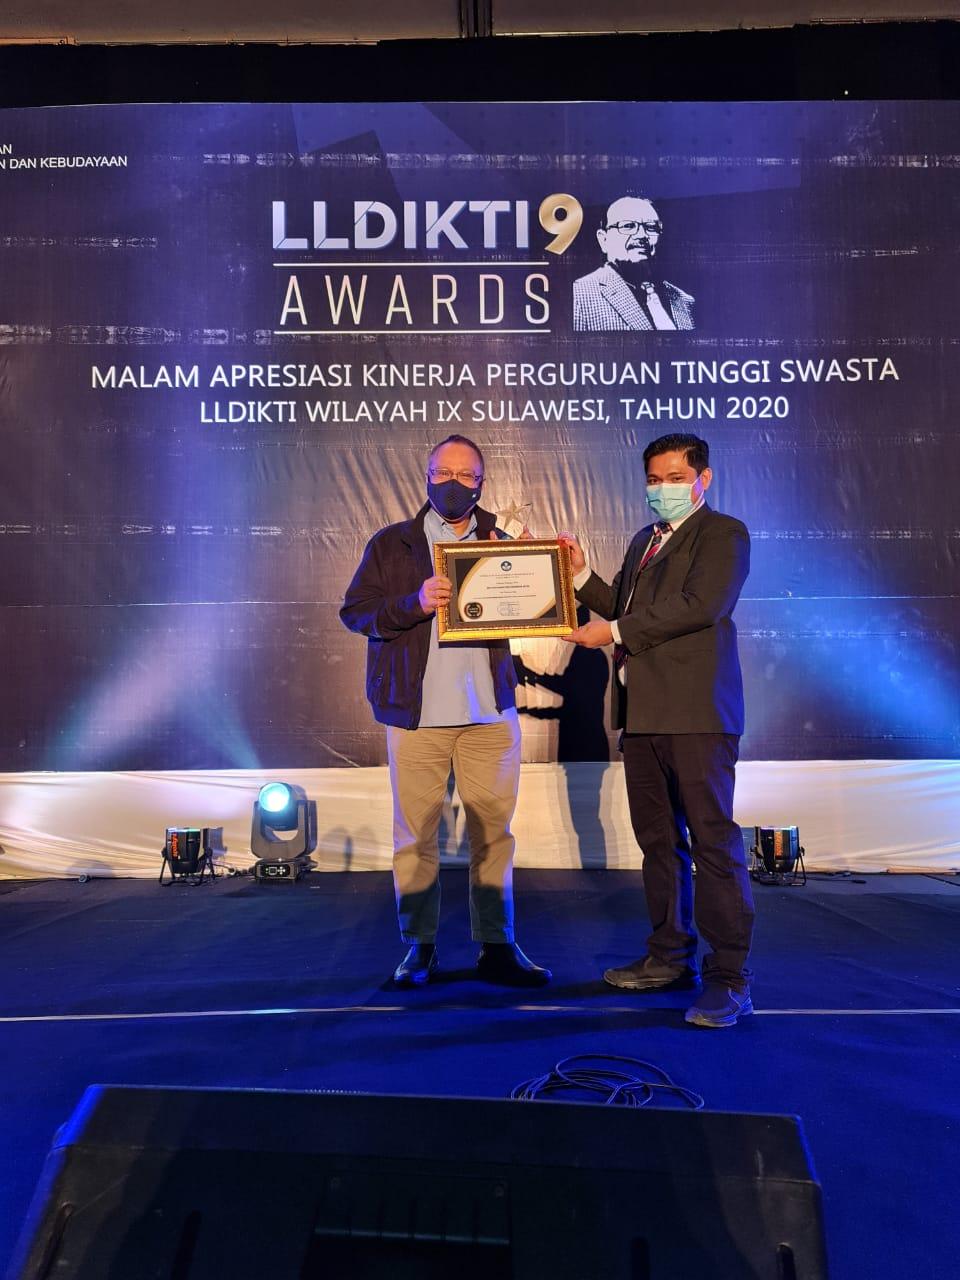 IBK Nitro Raih Penghargaan sebagai PTS dengan Kinerja Pelaporan Terbaik dalam LLDIKTI 9 Award